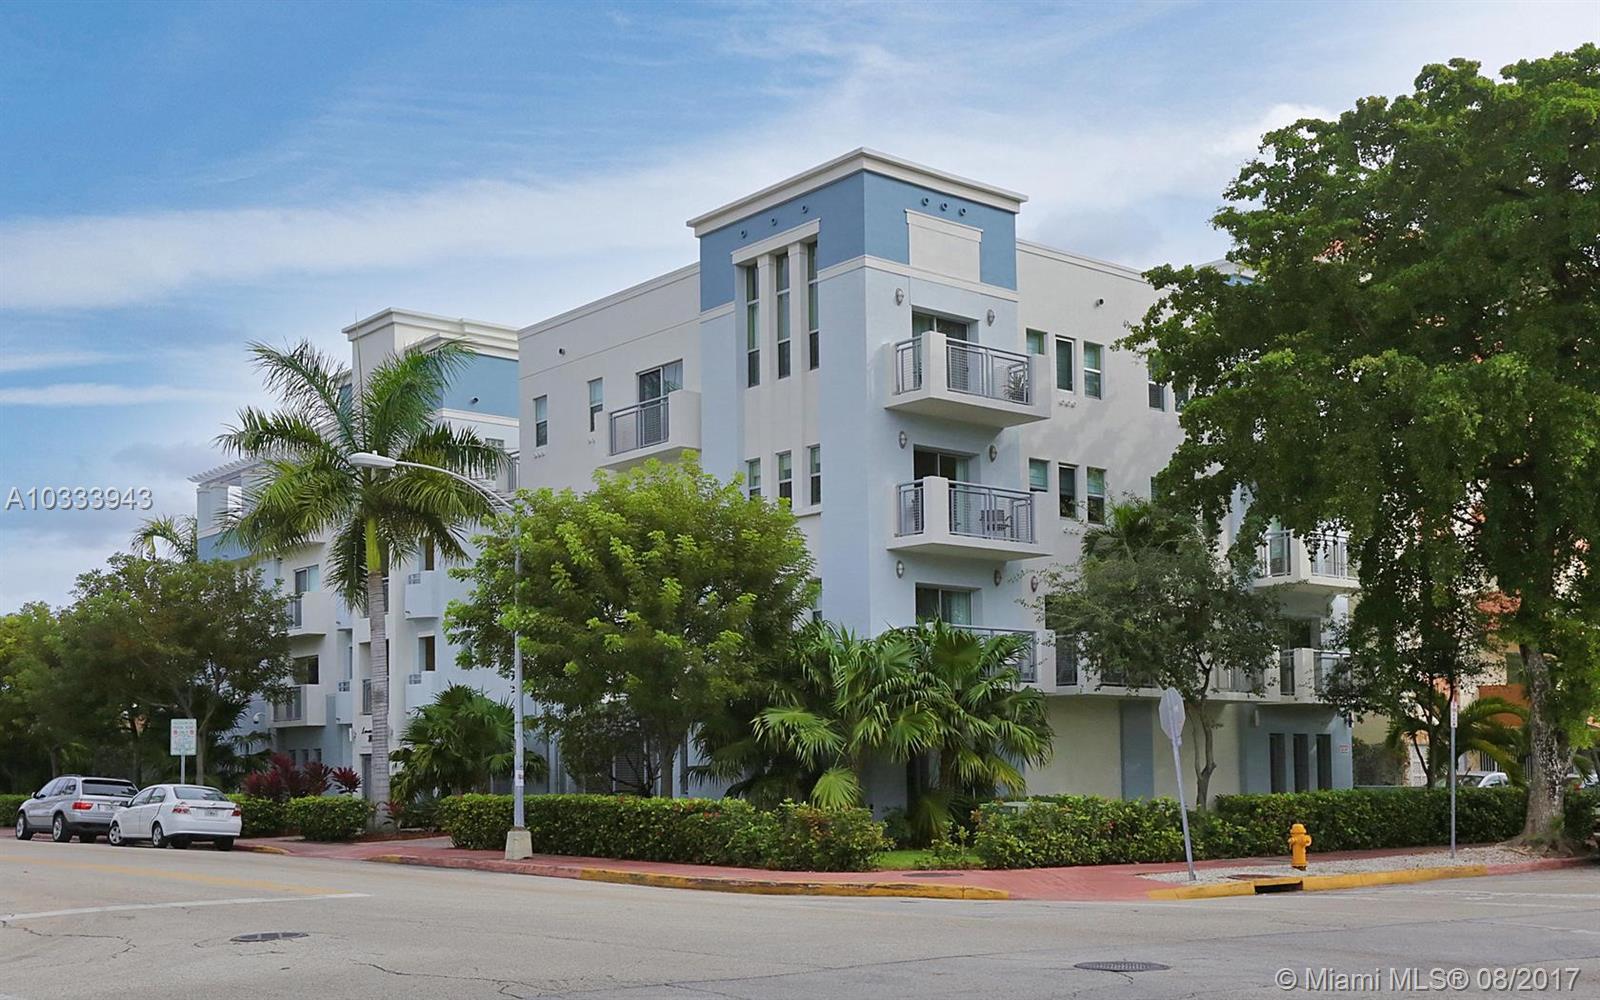 1040 10th St, 202 - Miami Beach, Florida